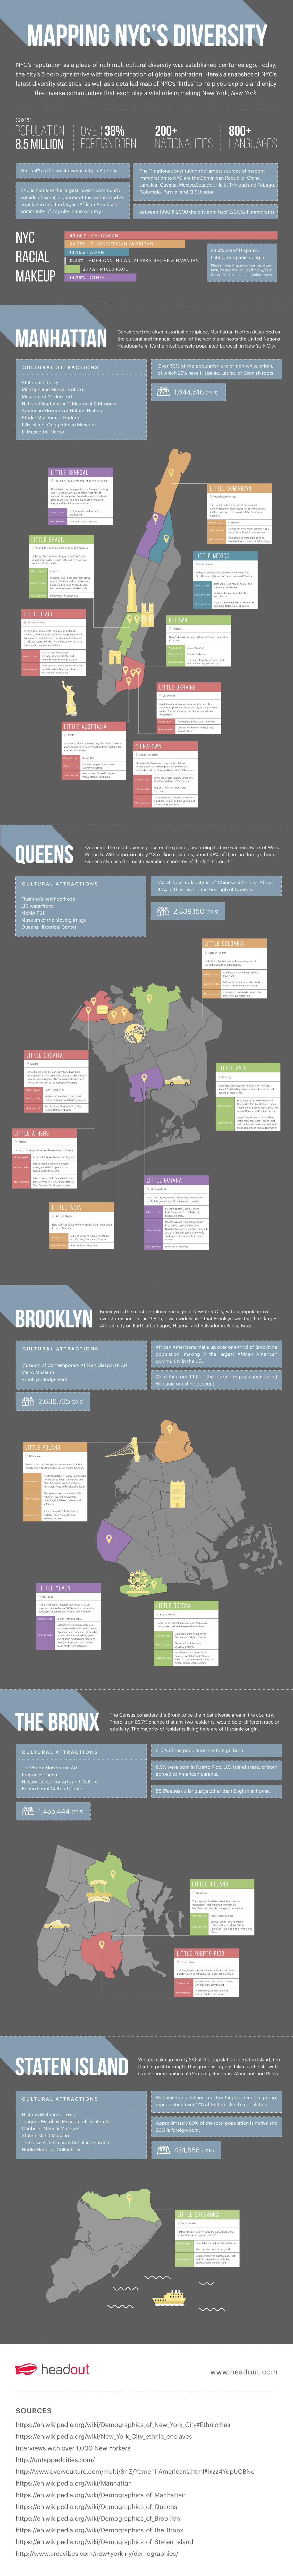 nyc-diversity-infographic-plaza